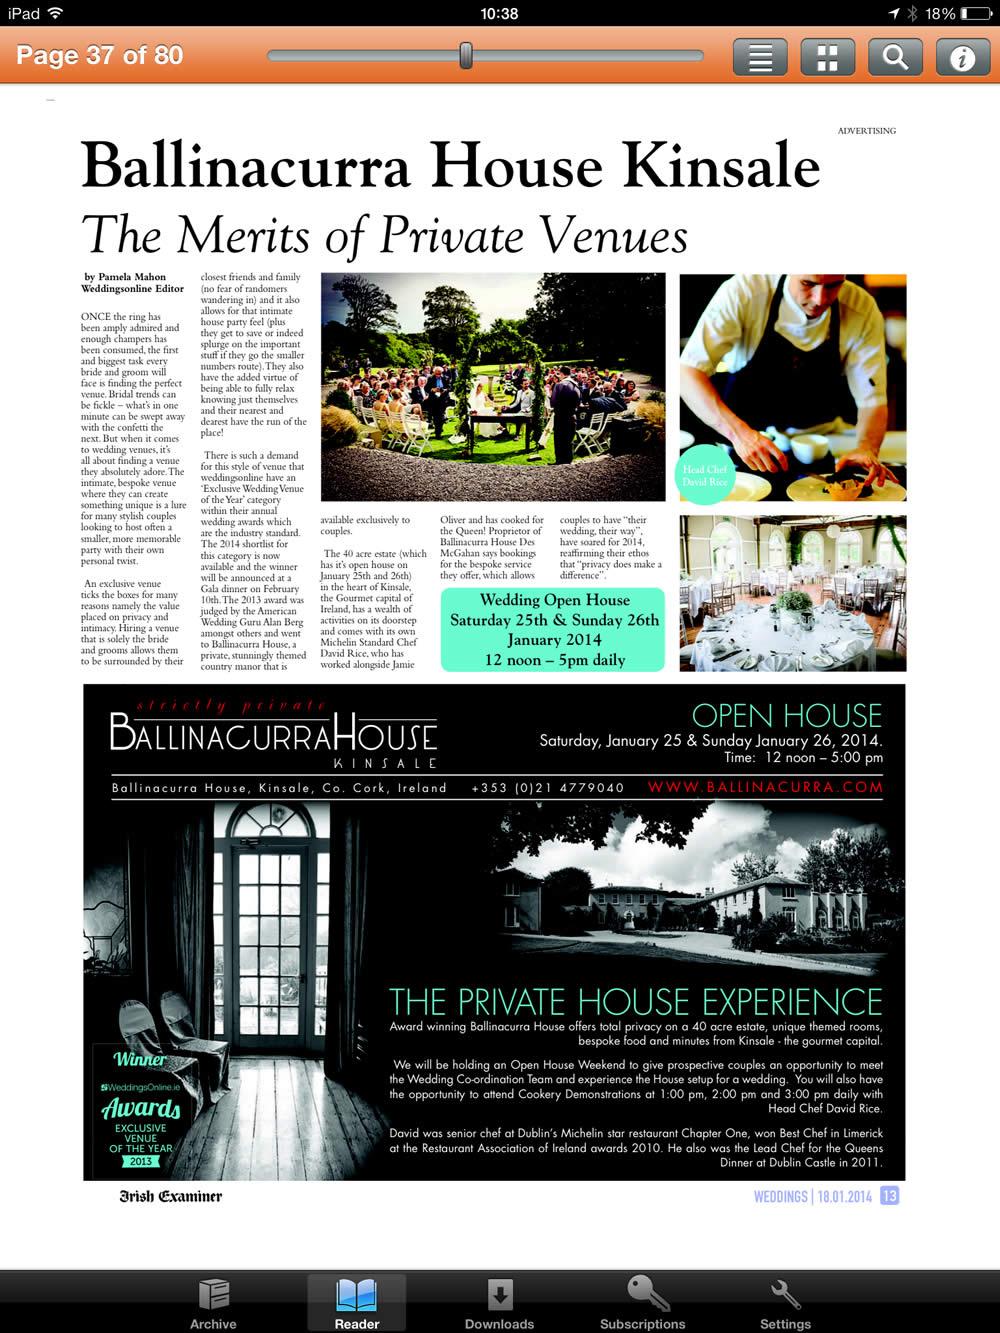 The Irish Examiner – January 18, 2014